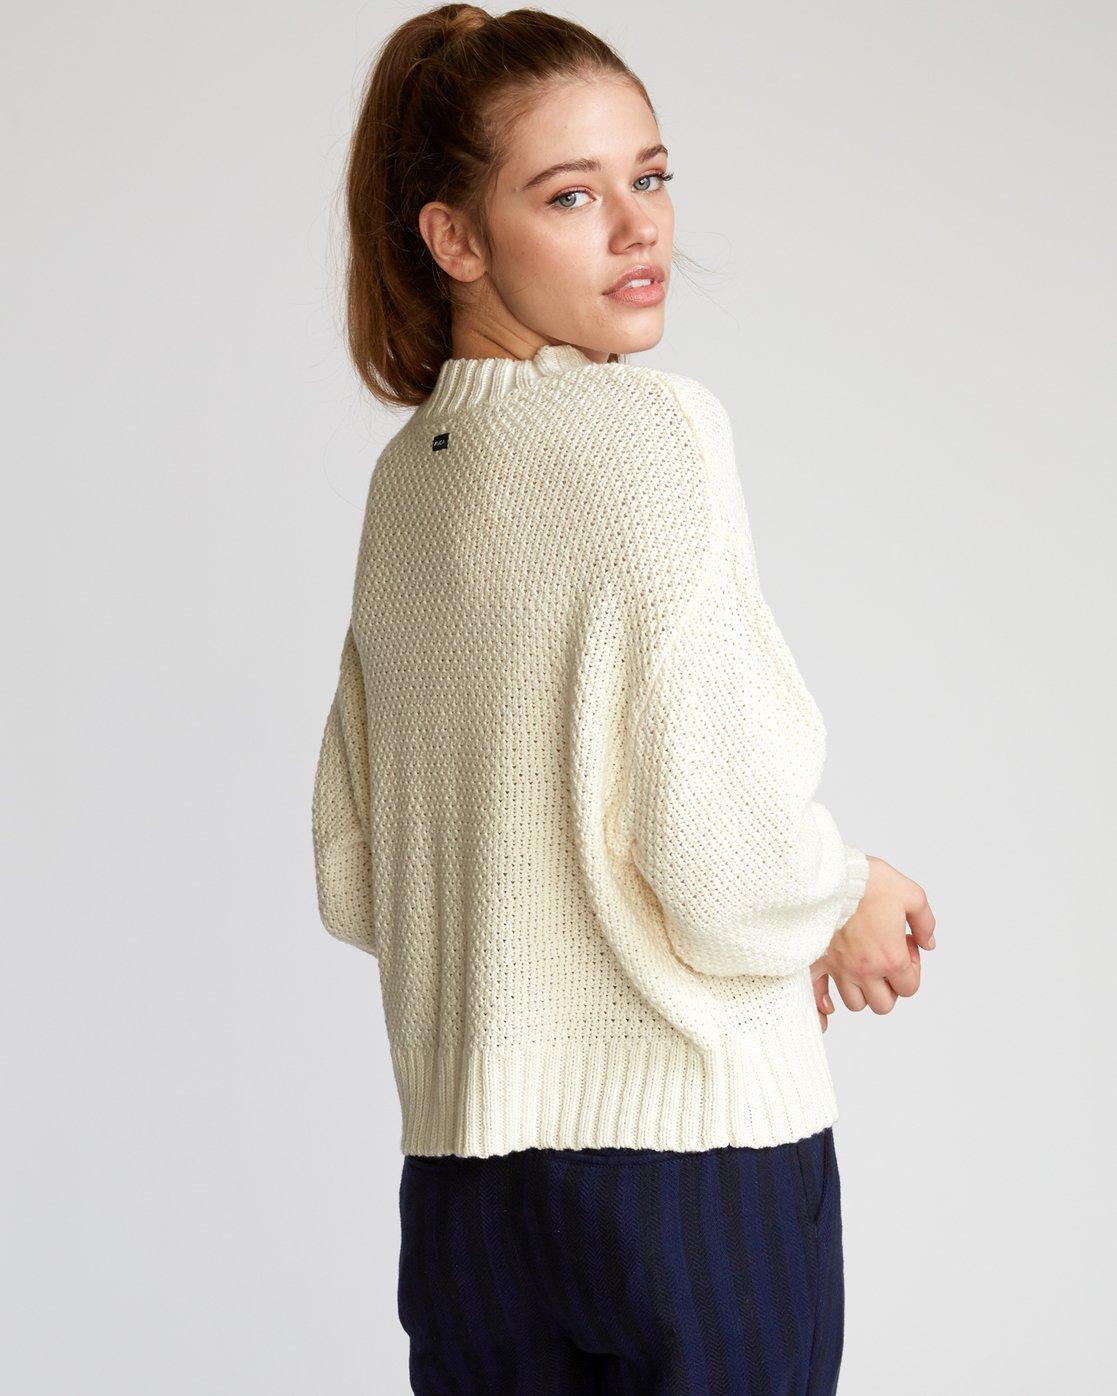 Volt Knit Mock Neck Sweater